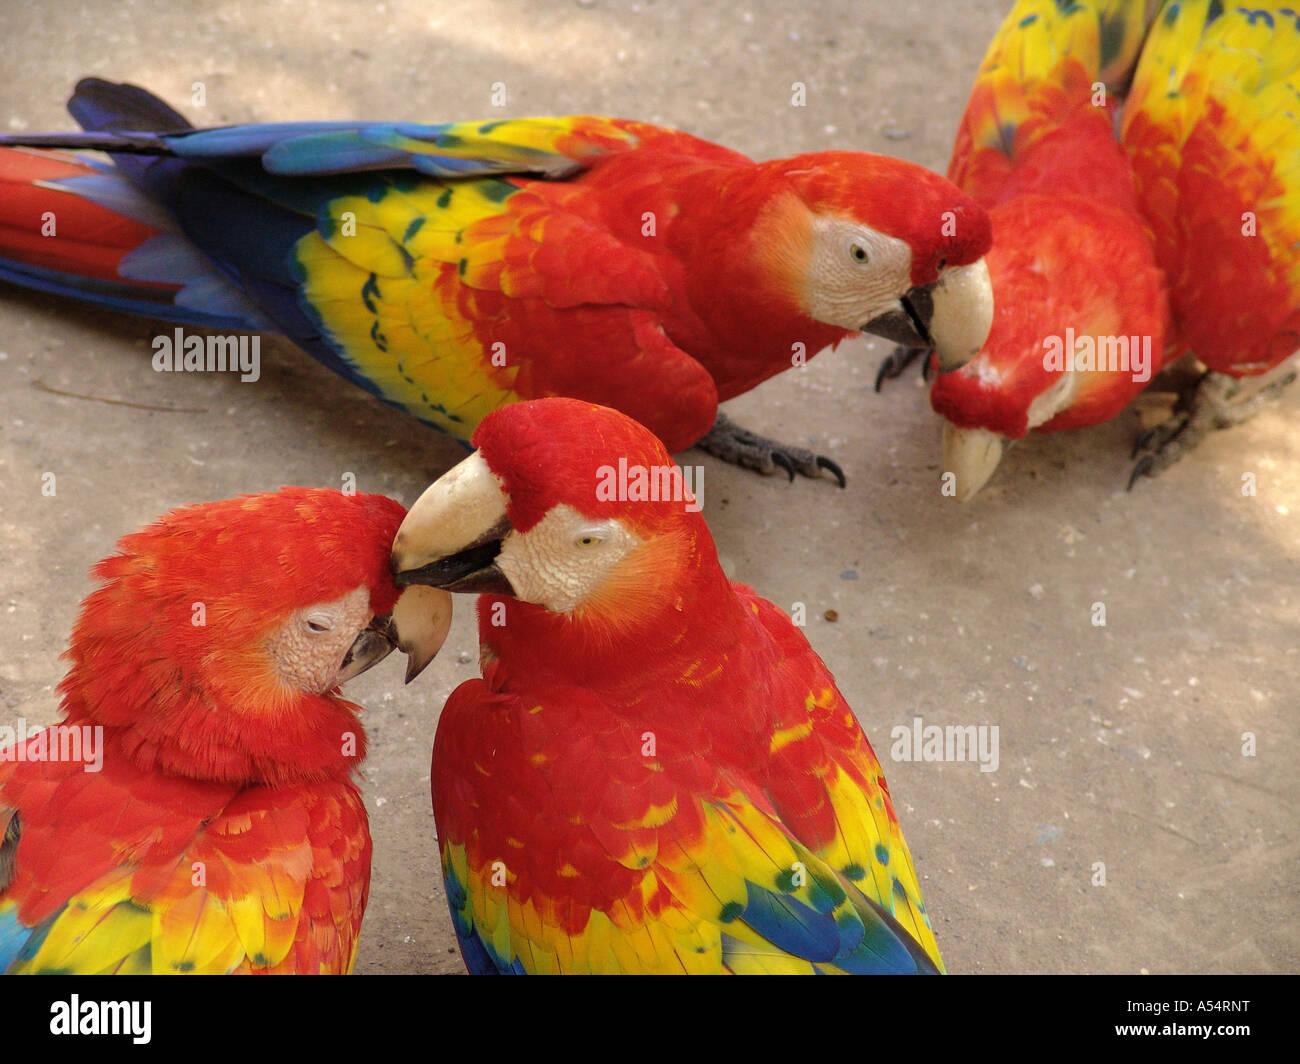 Unpretended Stock Photos & Unpretended Stock Images - Alamy